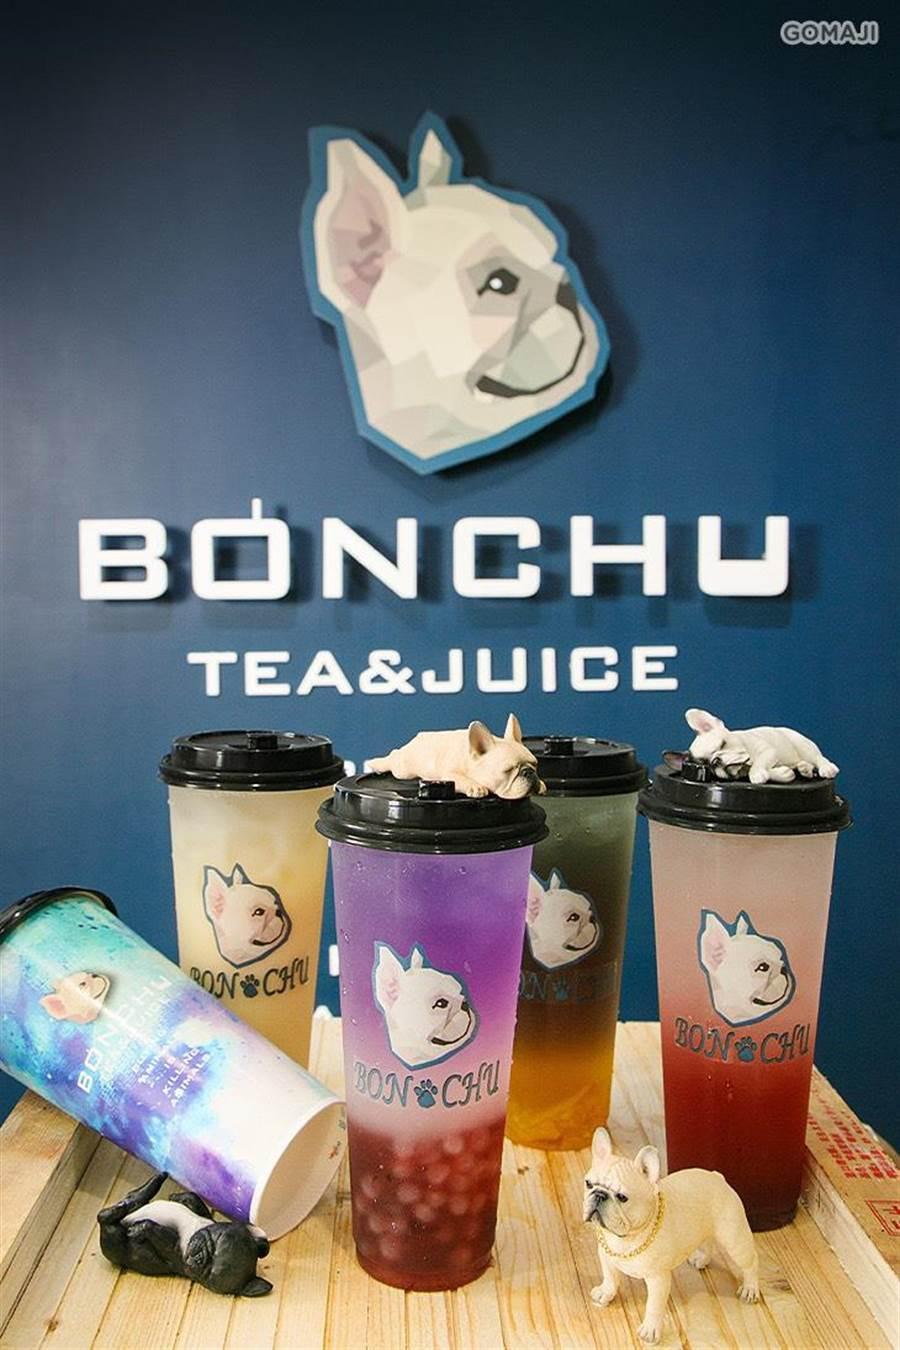 BONCHu創意茶飲28日前快閃進SOGO忠孝館,每杯49元至80元。(SOGO提供)